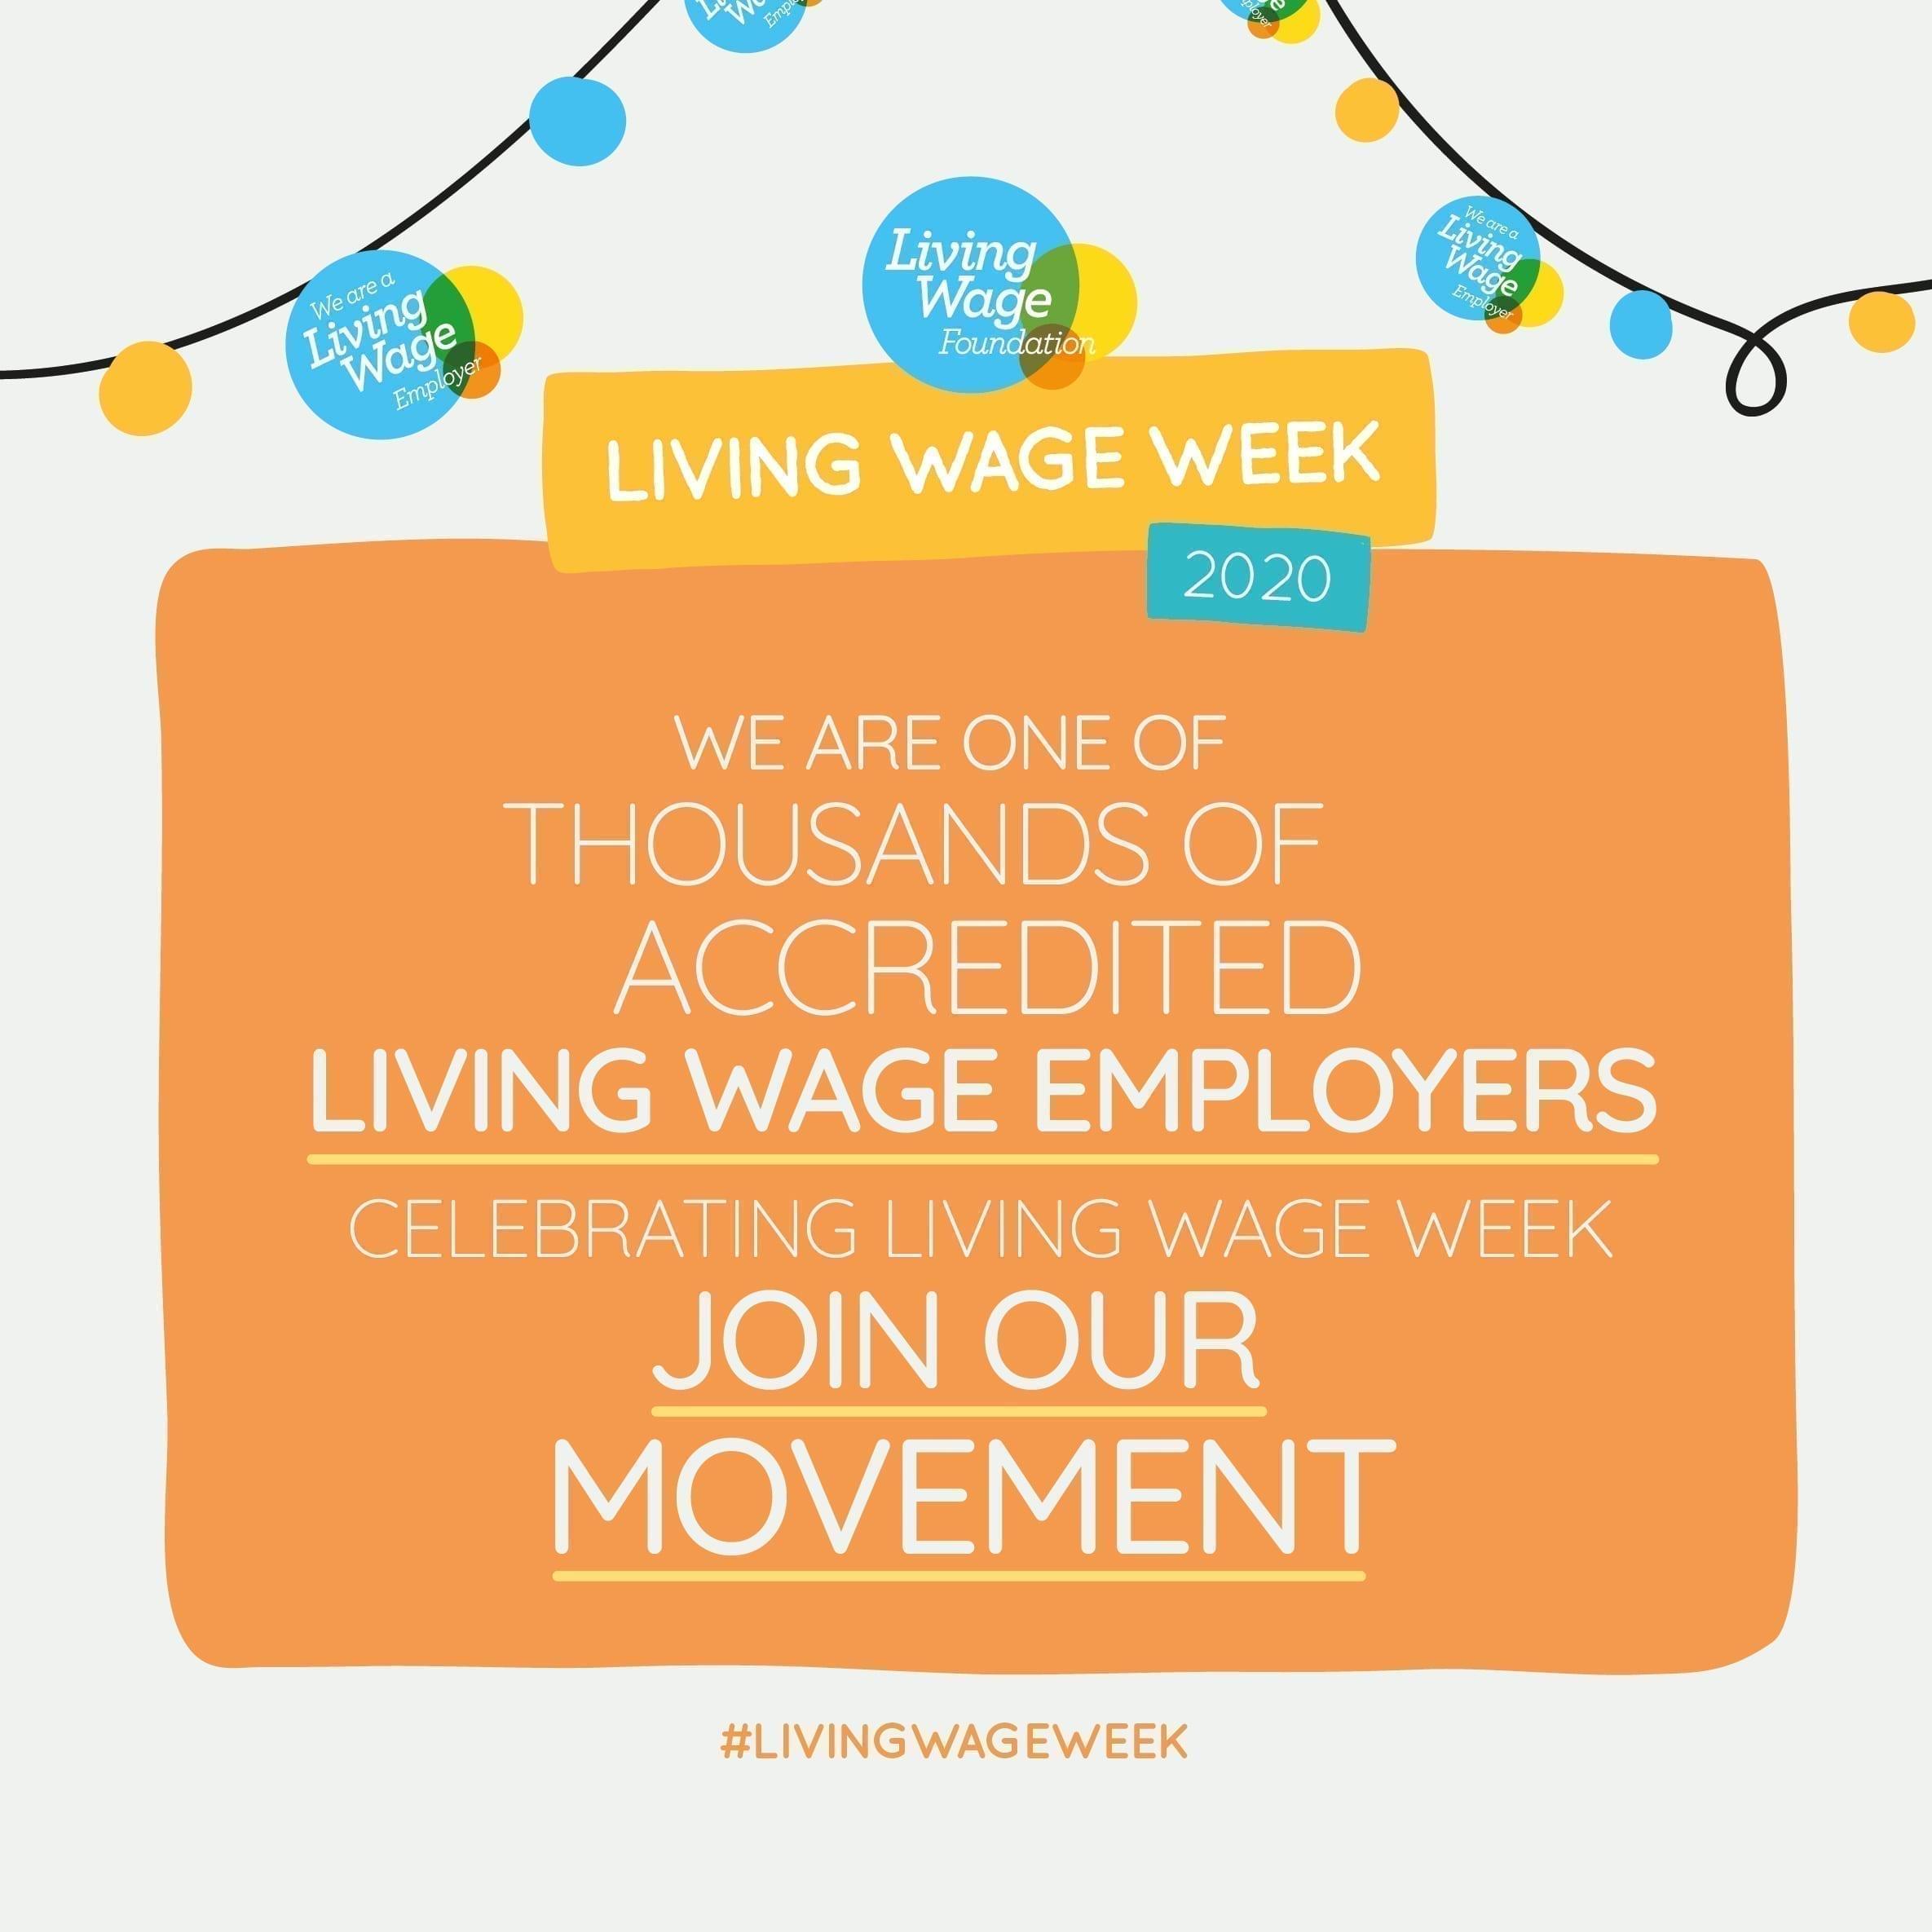 Living Wage Week